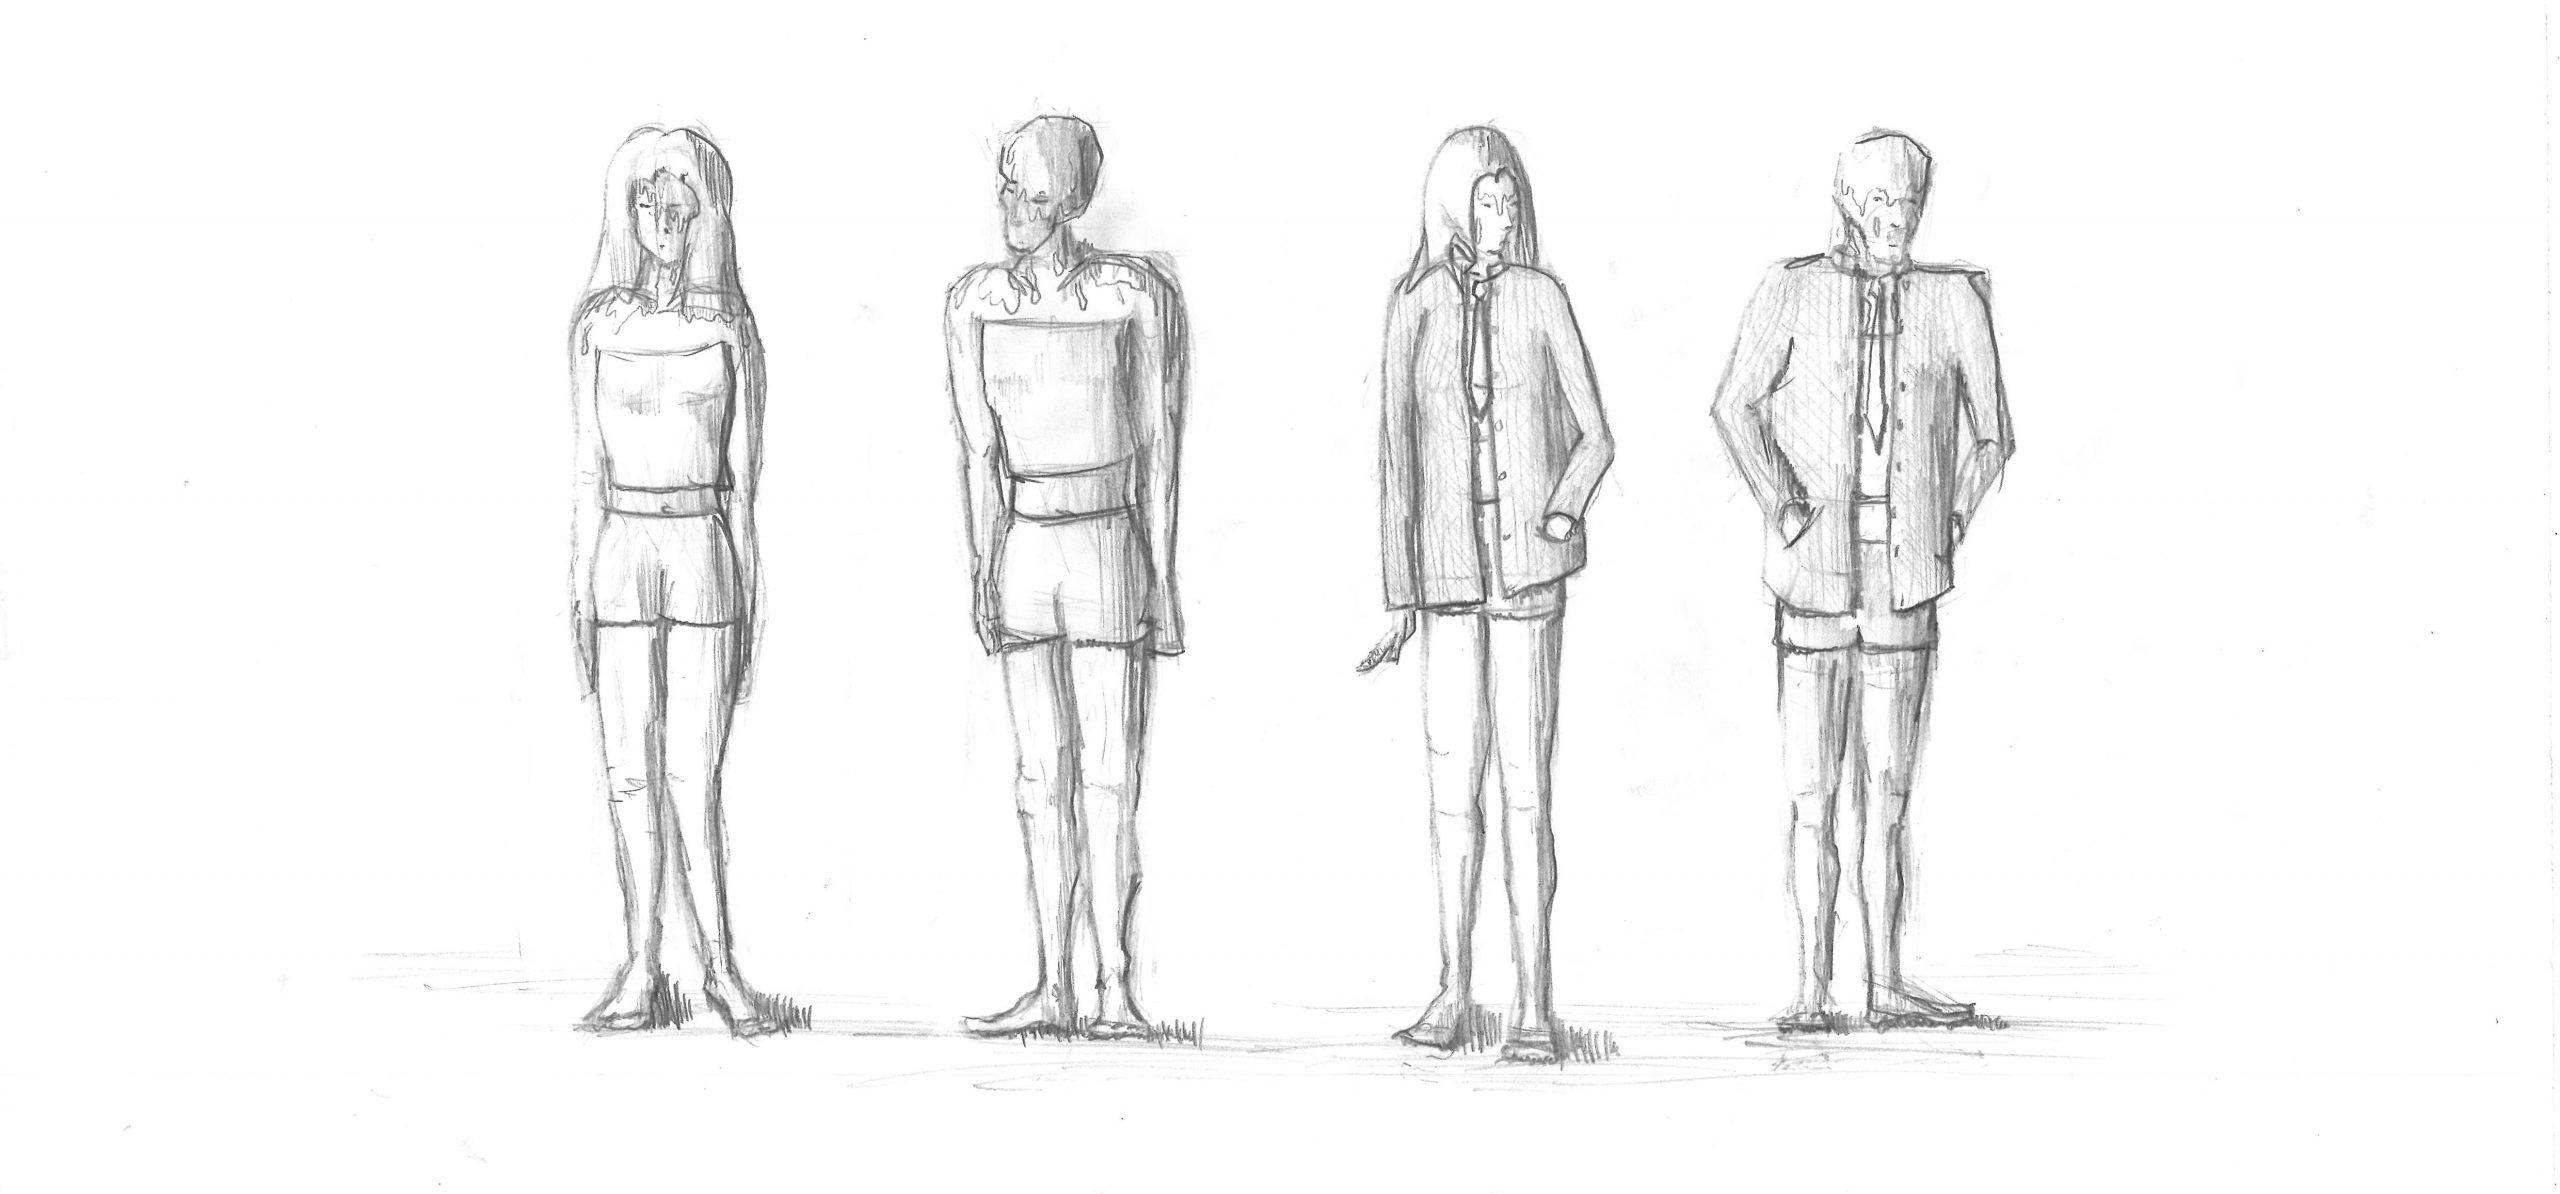 Projekt Parzival Zeichnung Kostüm Jugendclub